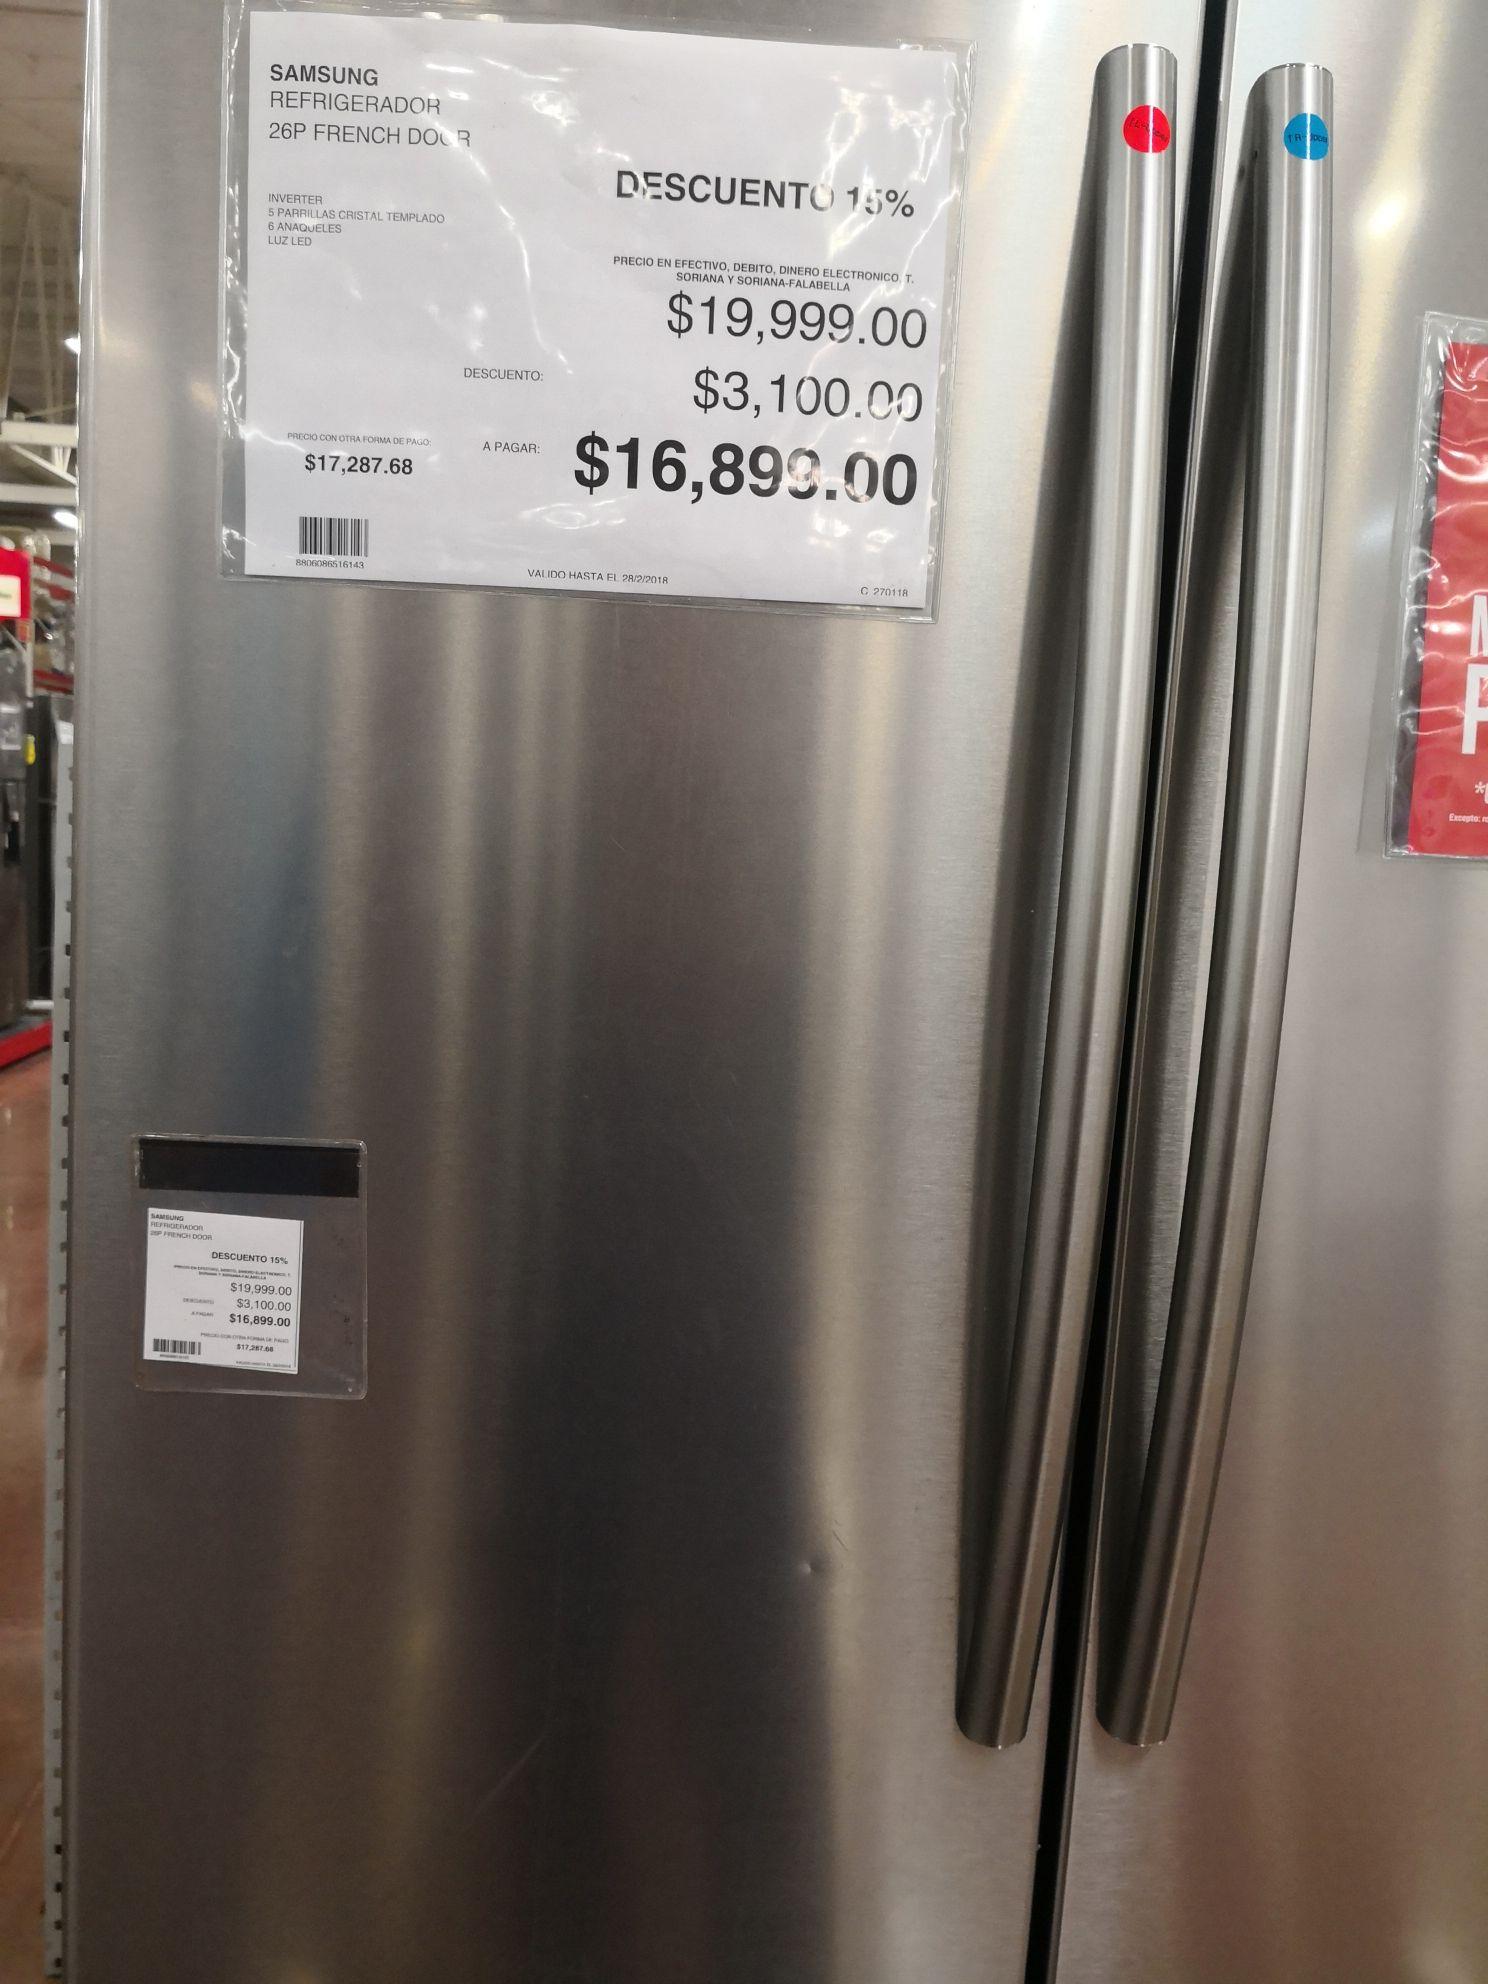 City Club: Refrigerador Samsung Inverter 26p3 french door